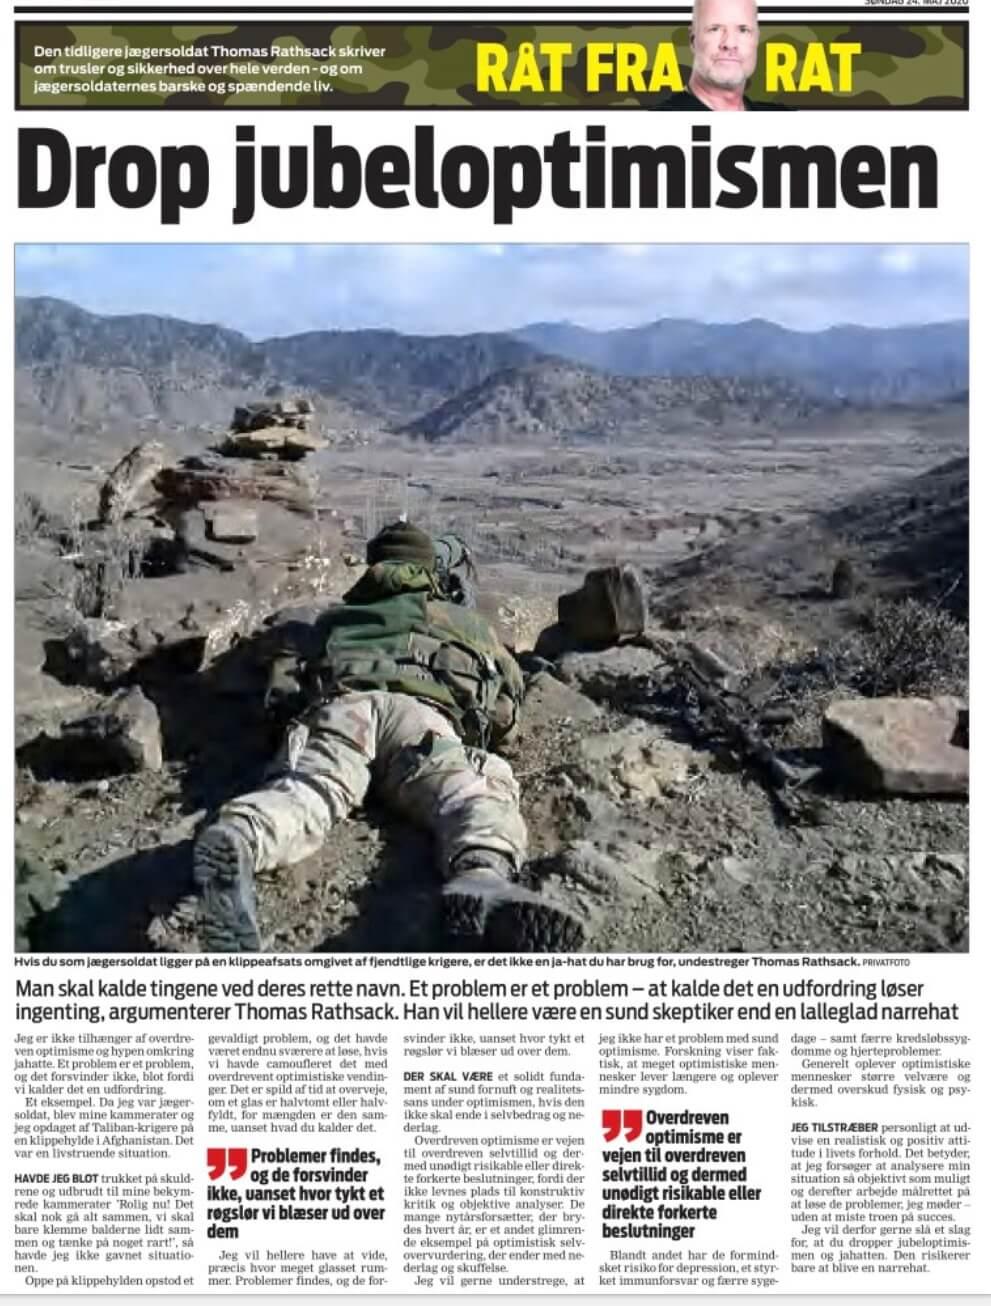 Drop jubeloptimismen